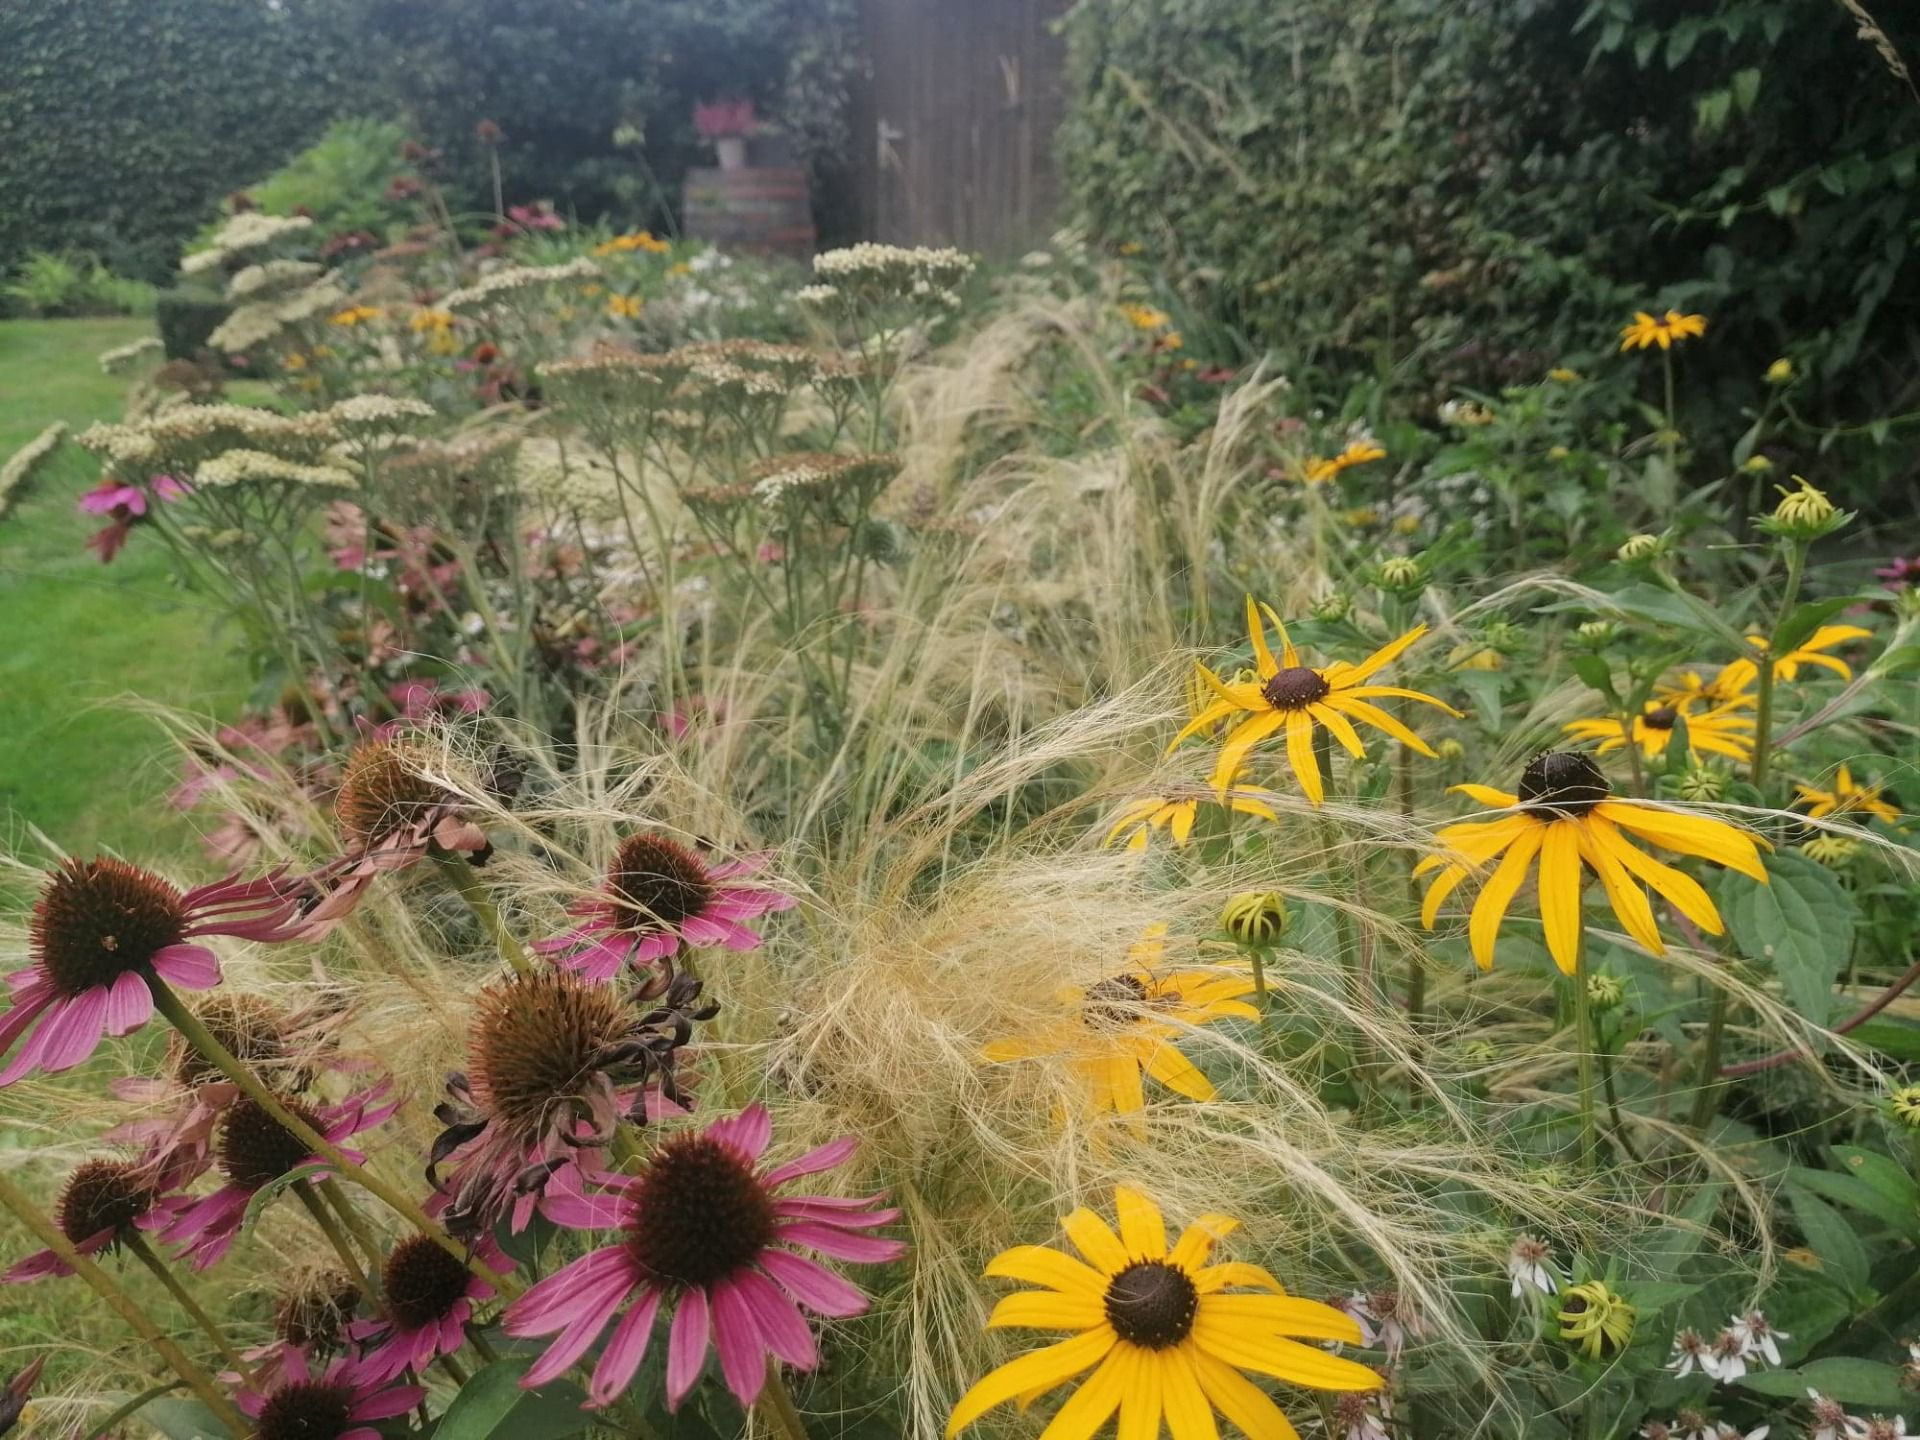 Borderpakket dries close up kant en klare tuin